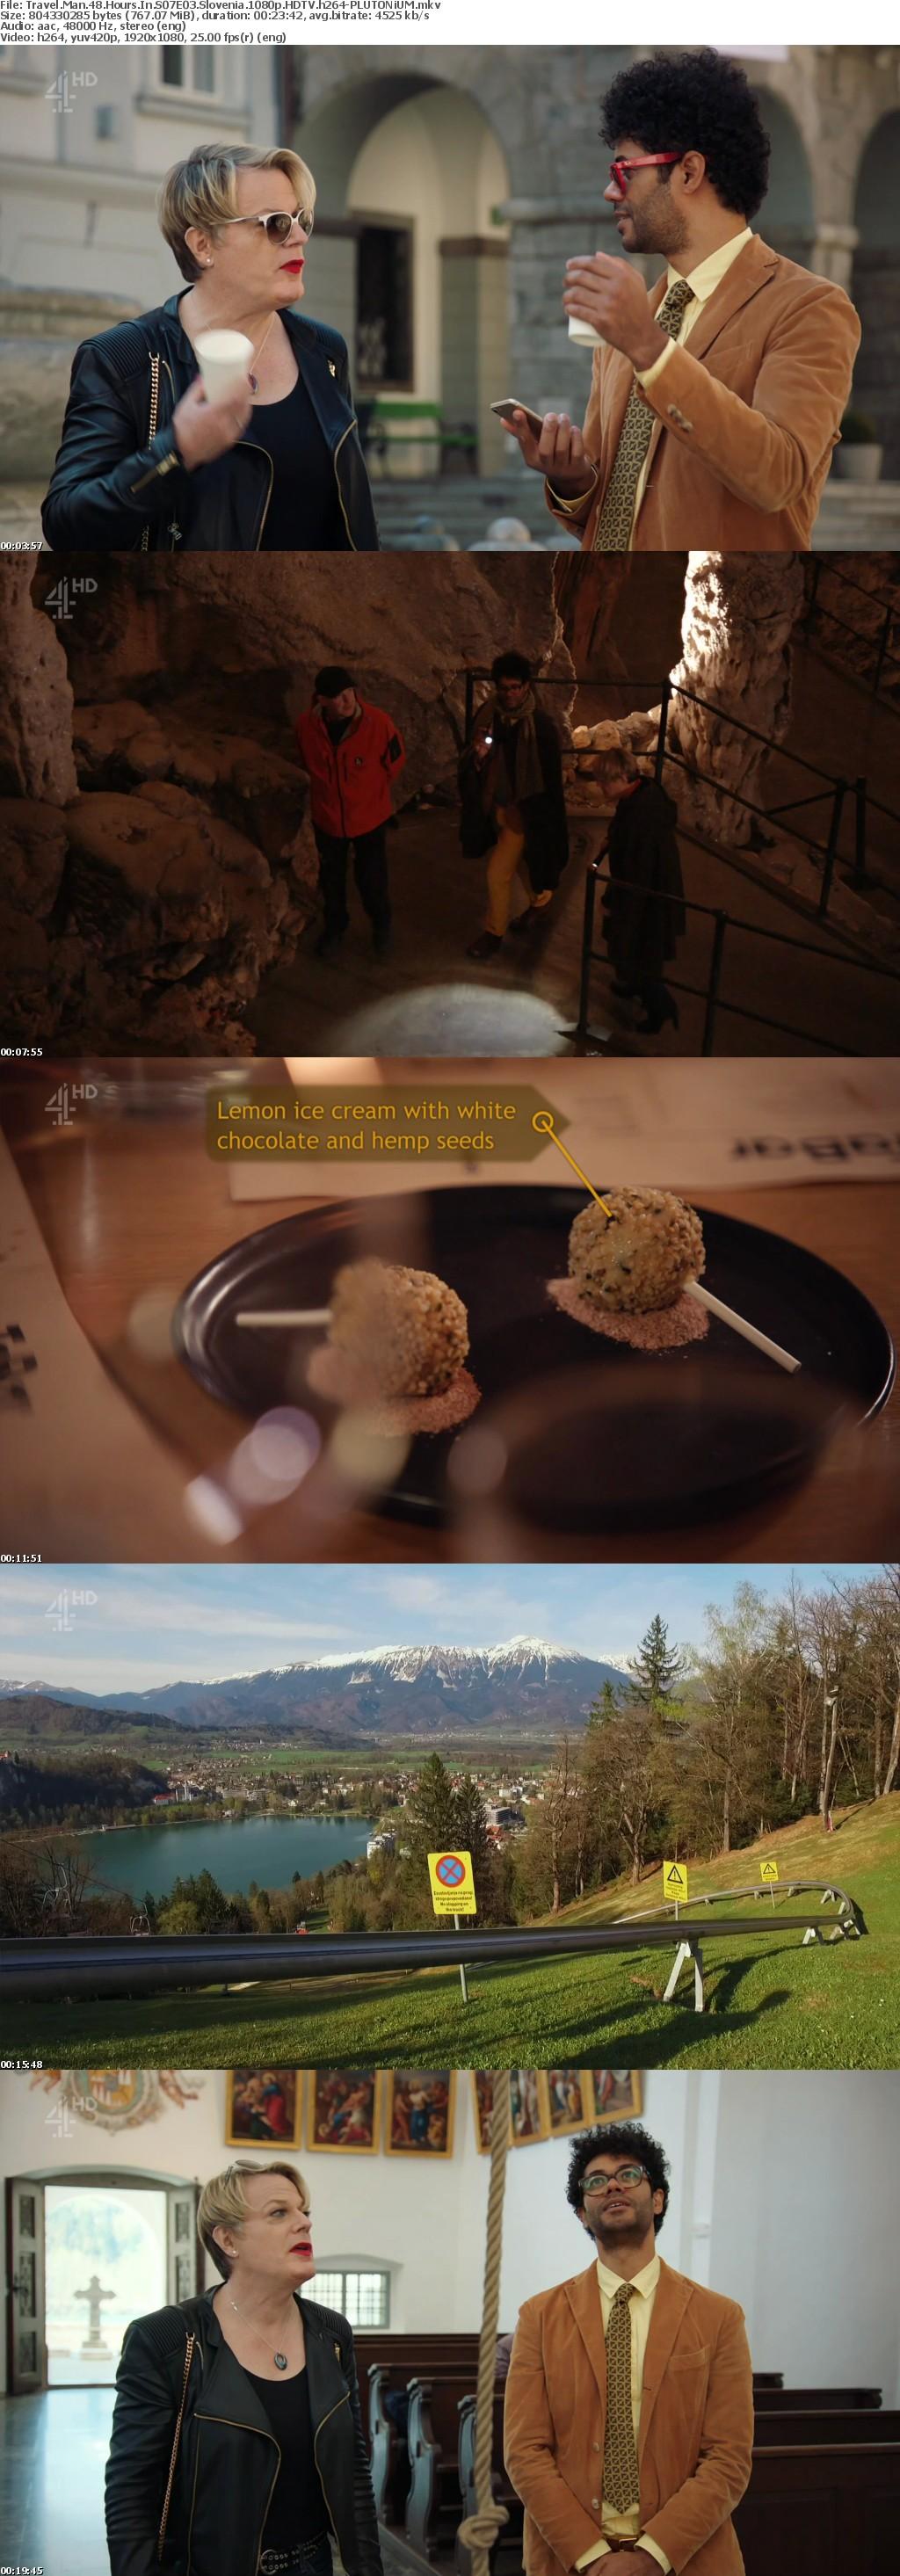 Travel Man 48 Hours In S08E03 Slovenia 1080p HDTV h264-PLUTONiUM